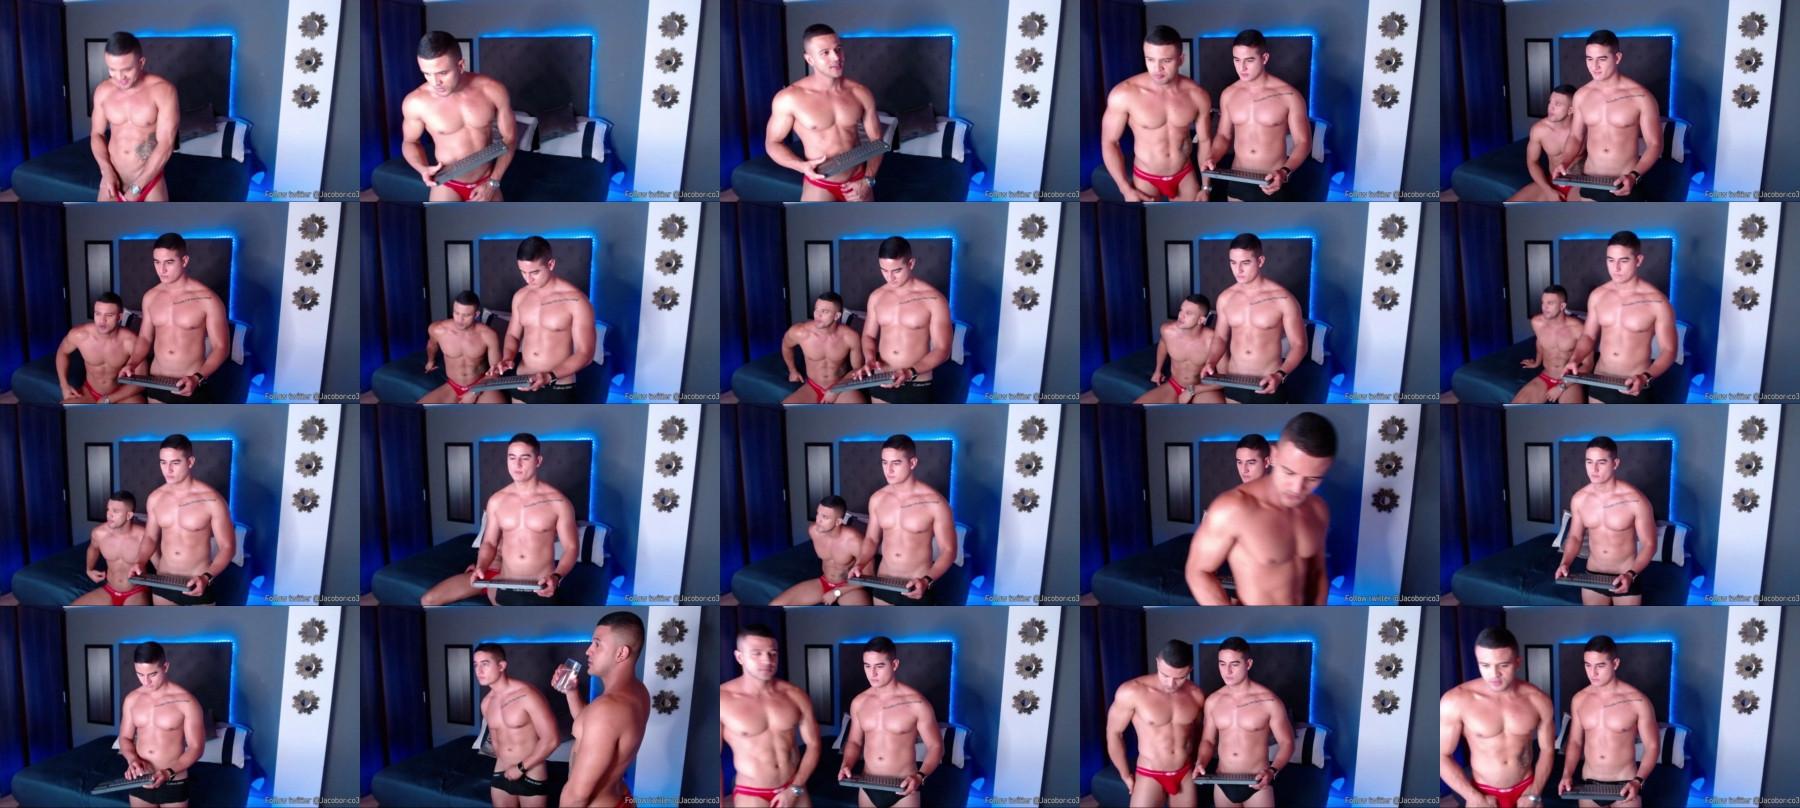 Jacobo_And_Rico_Mg Chaturbate 07-05-2021 video Naked